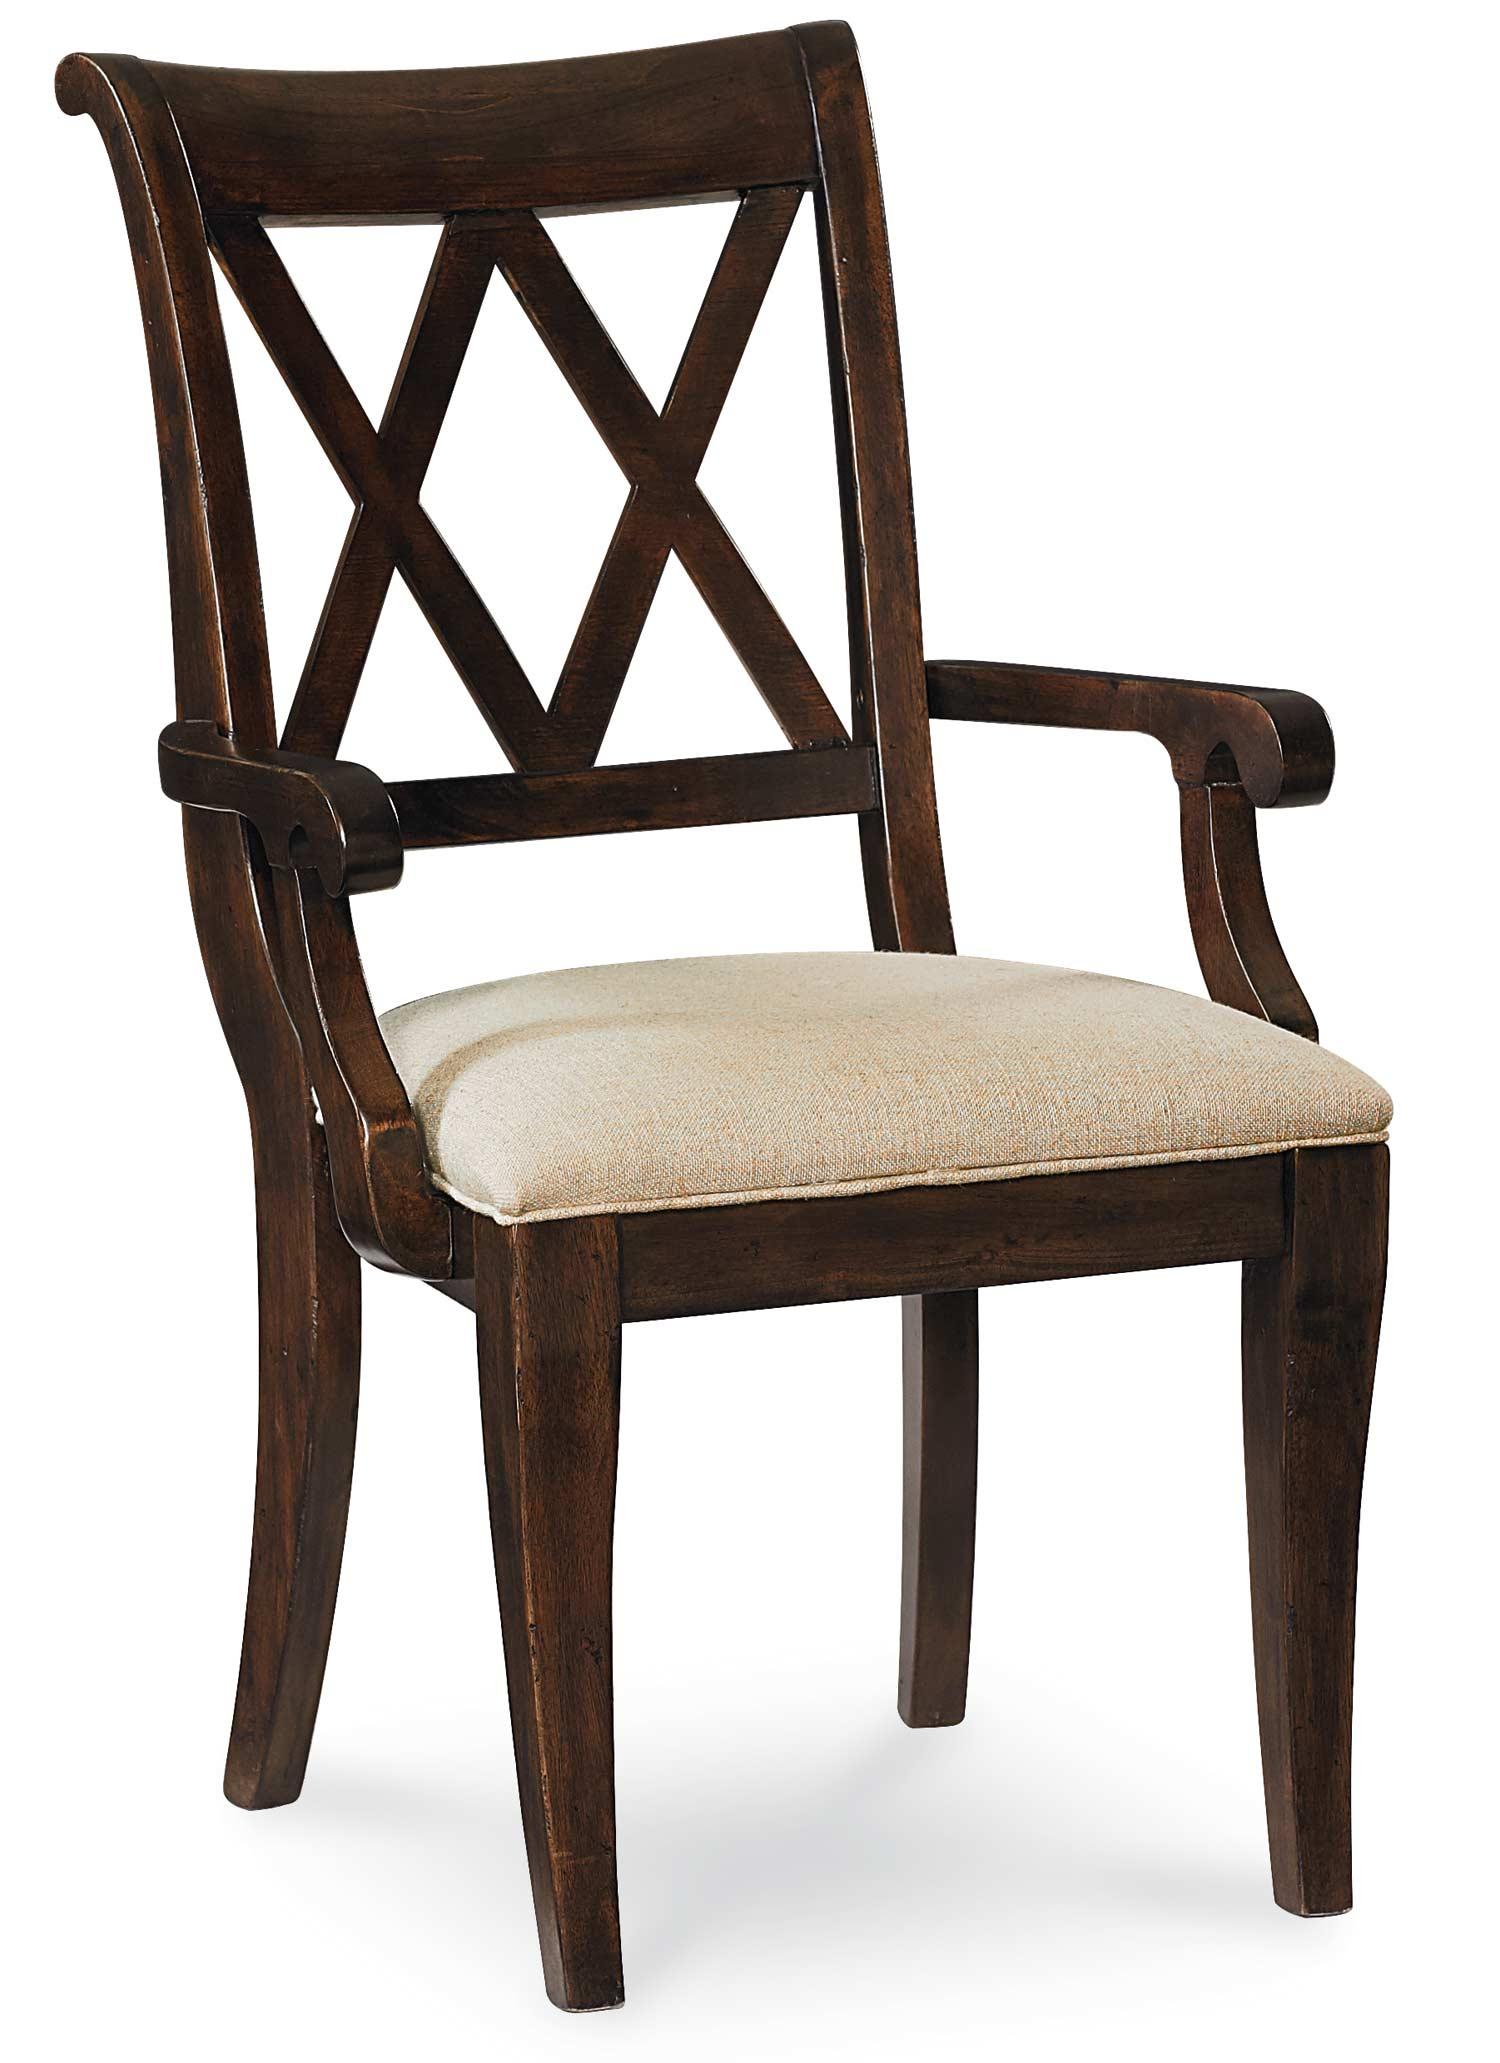 Legacy Classic Thatcher X Back Arm Chair - Amber